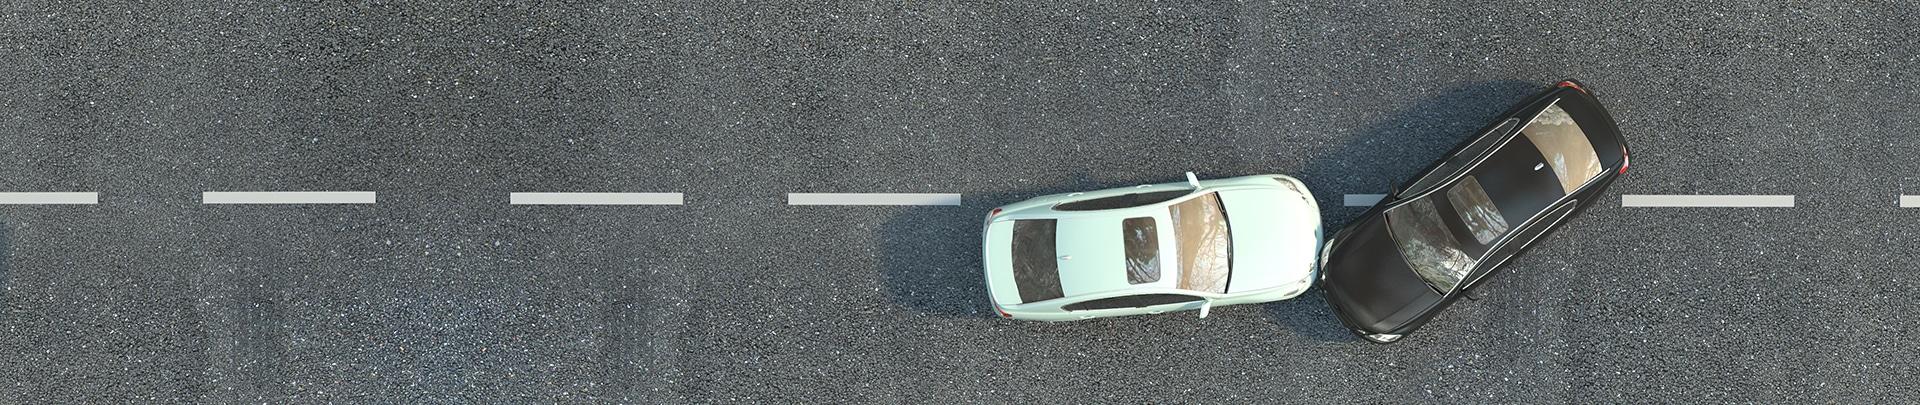 skade bilkollisjon